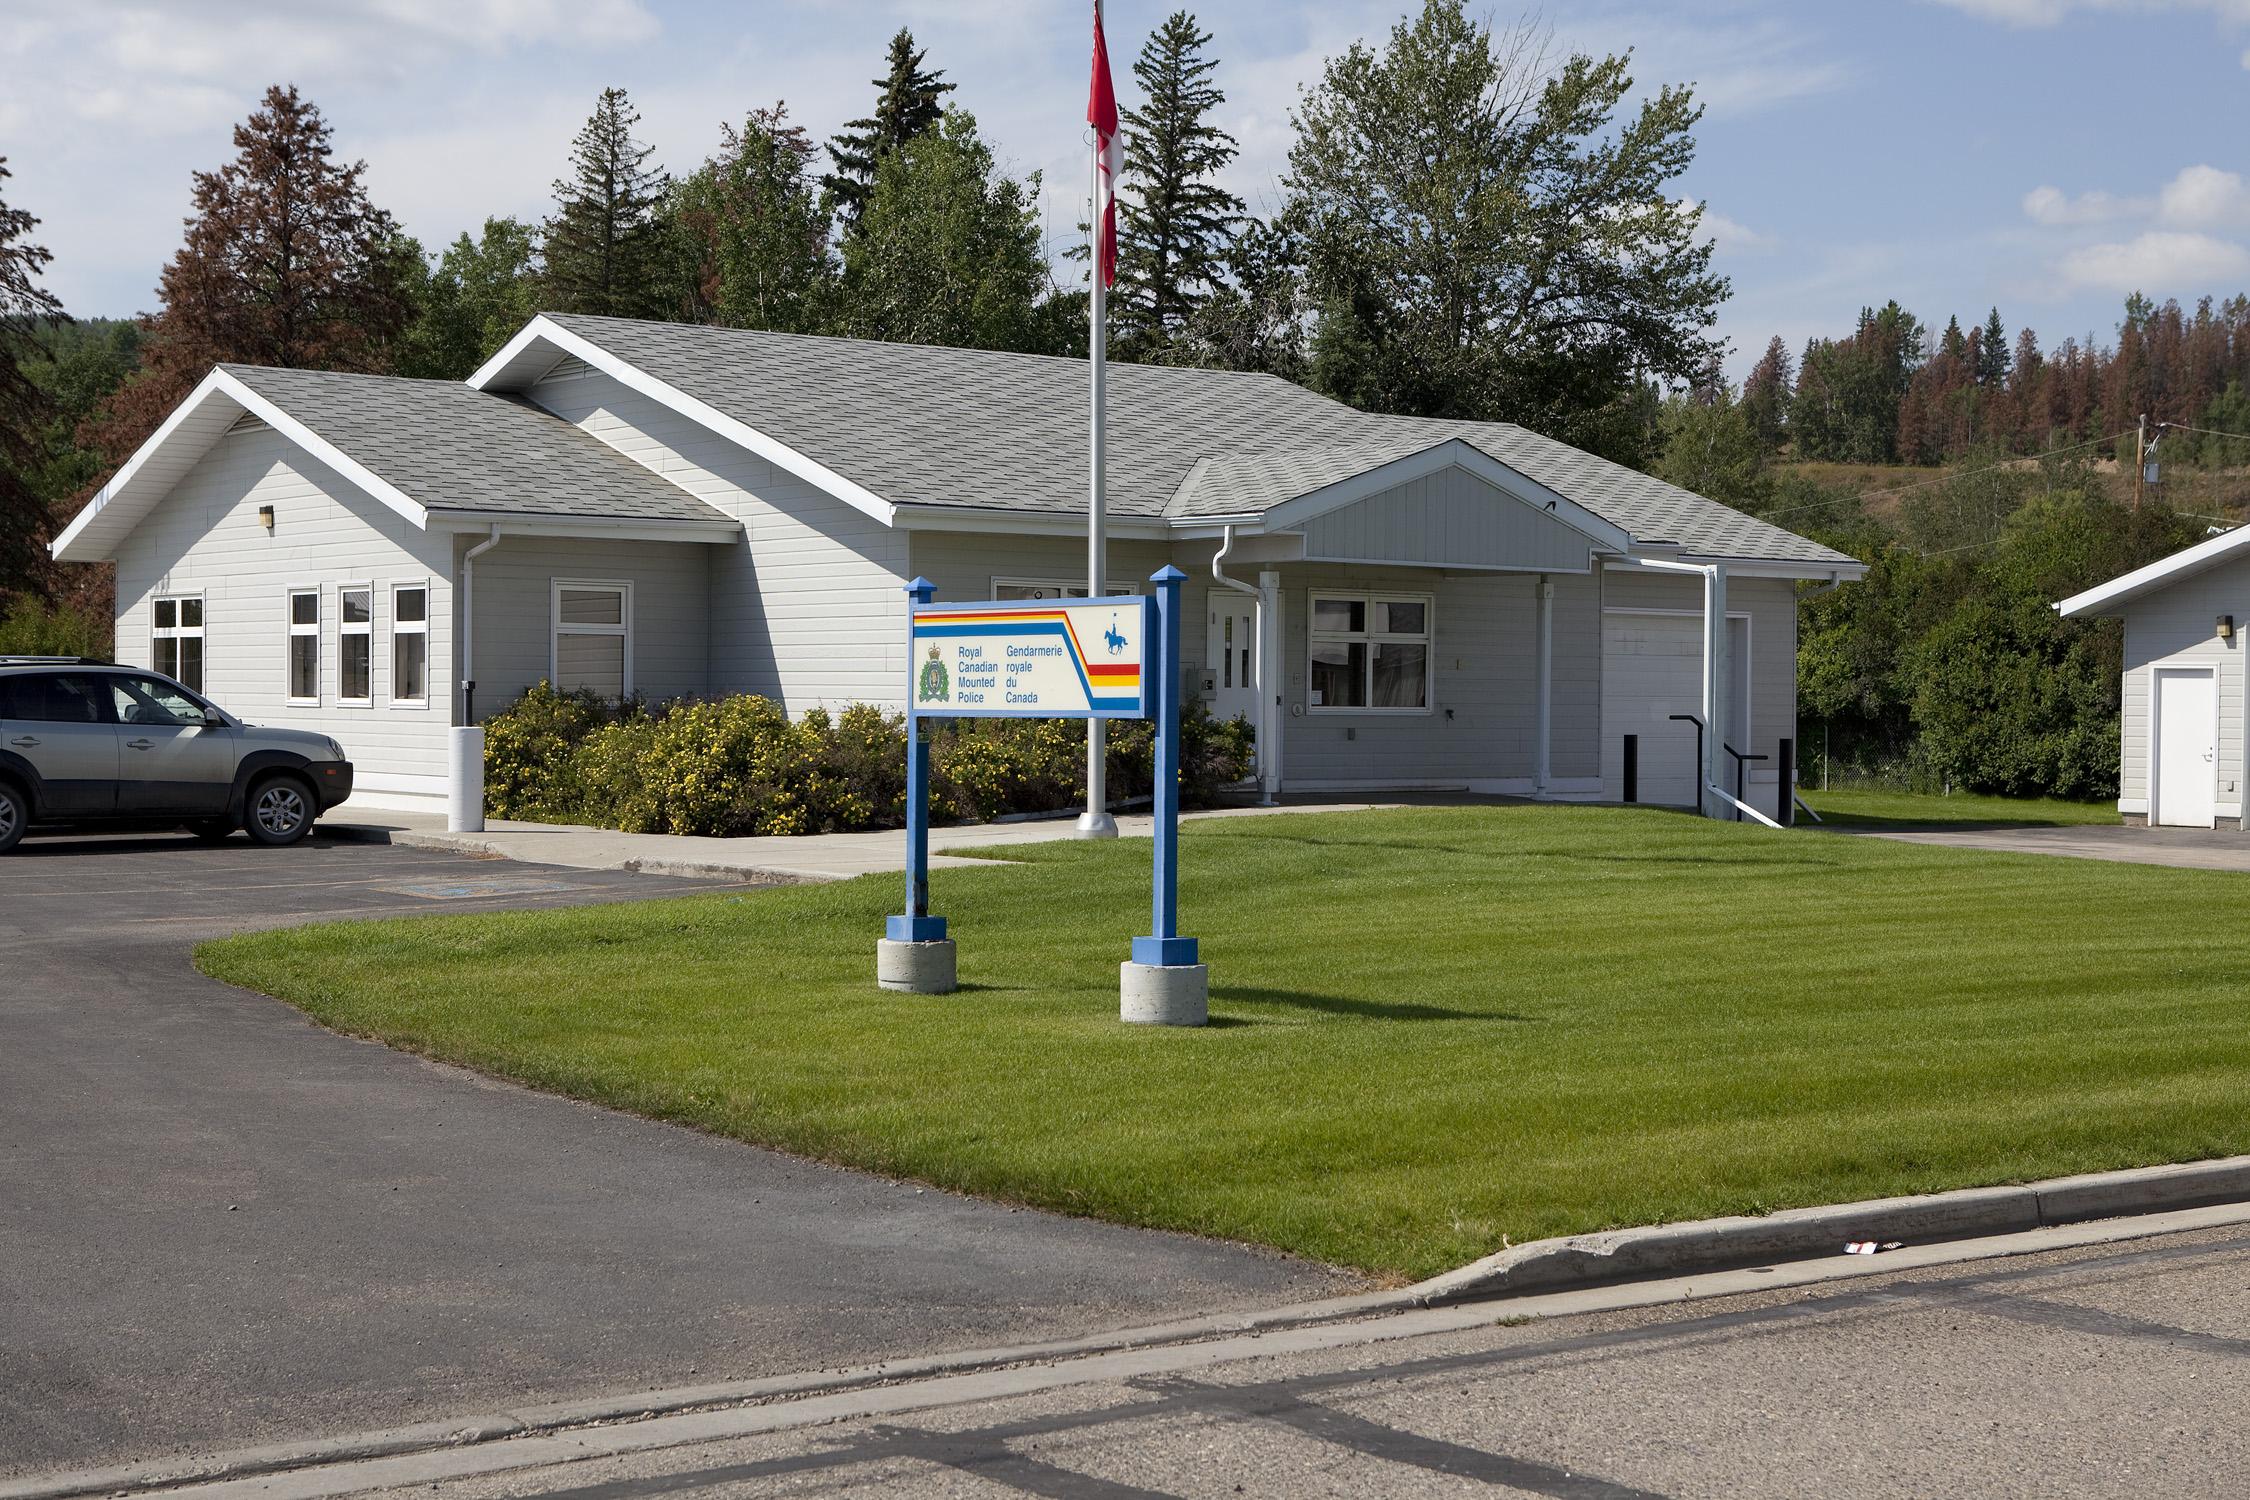 RCMP Hope (Canada)